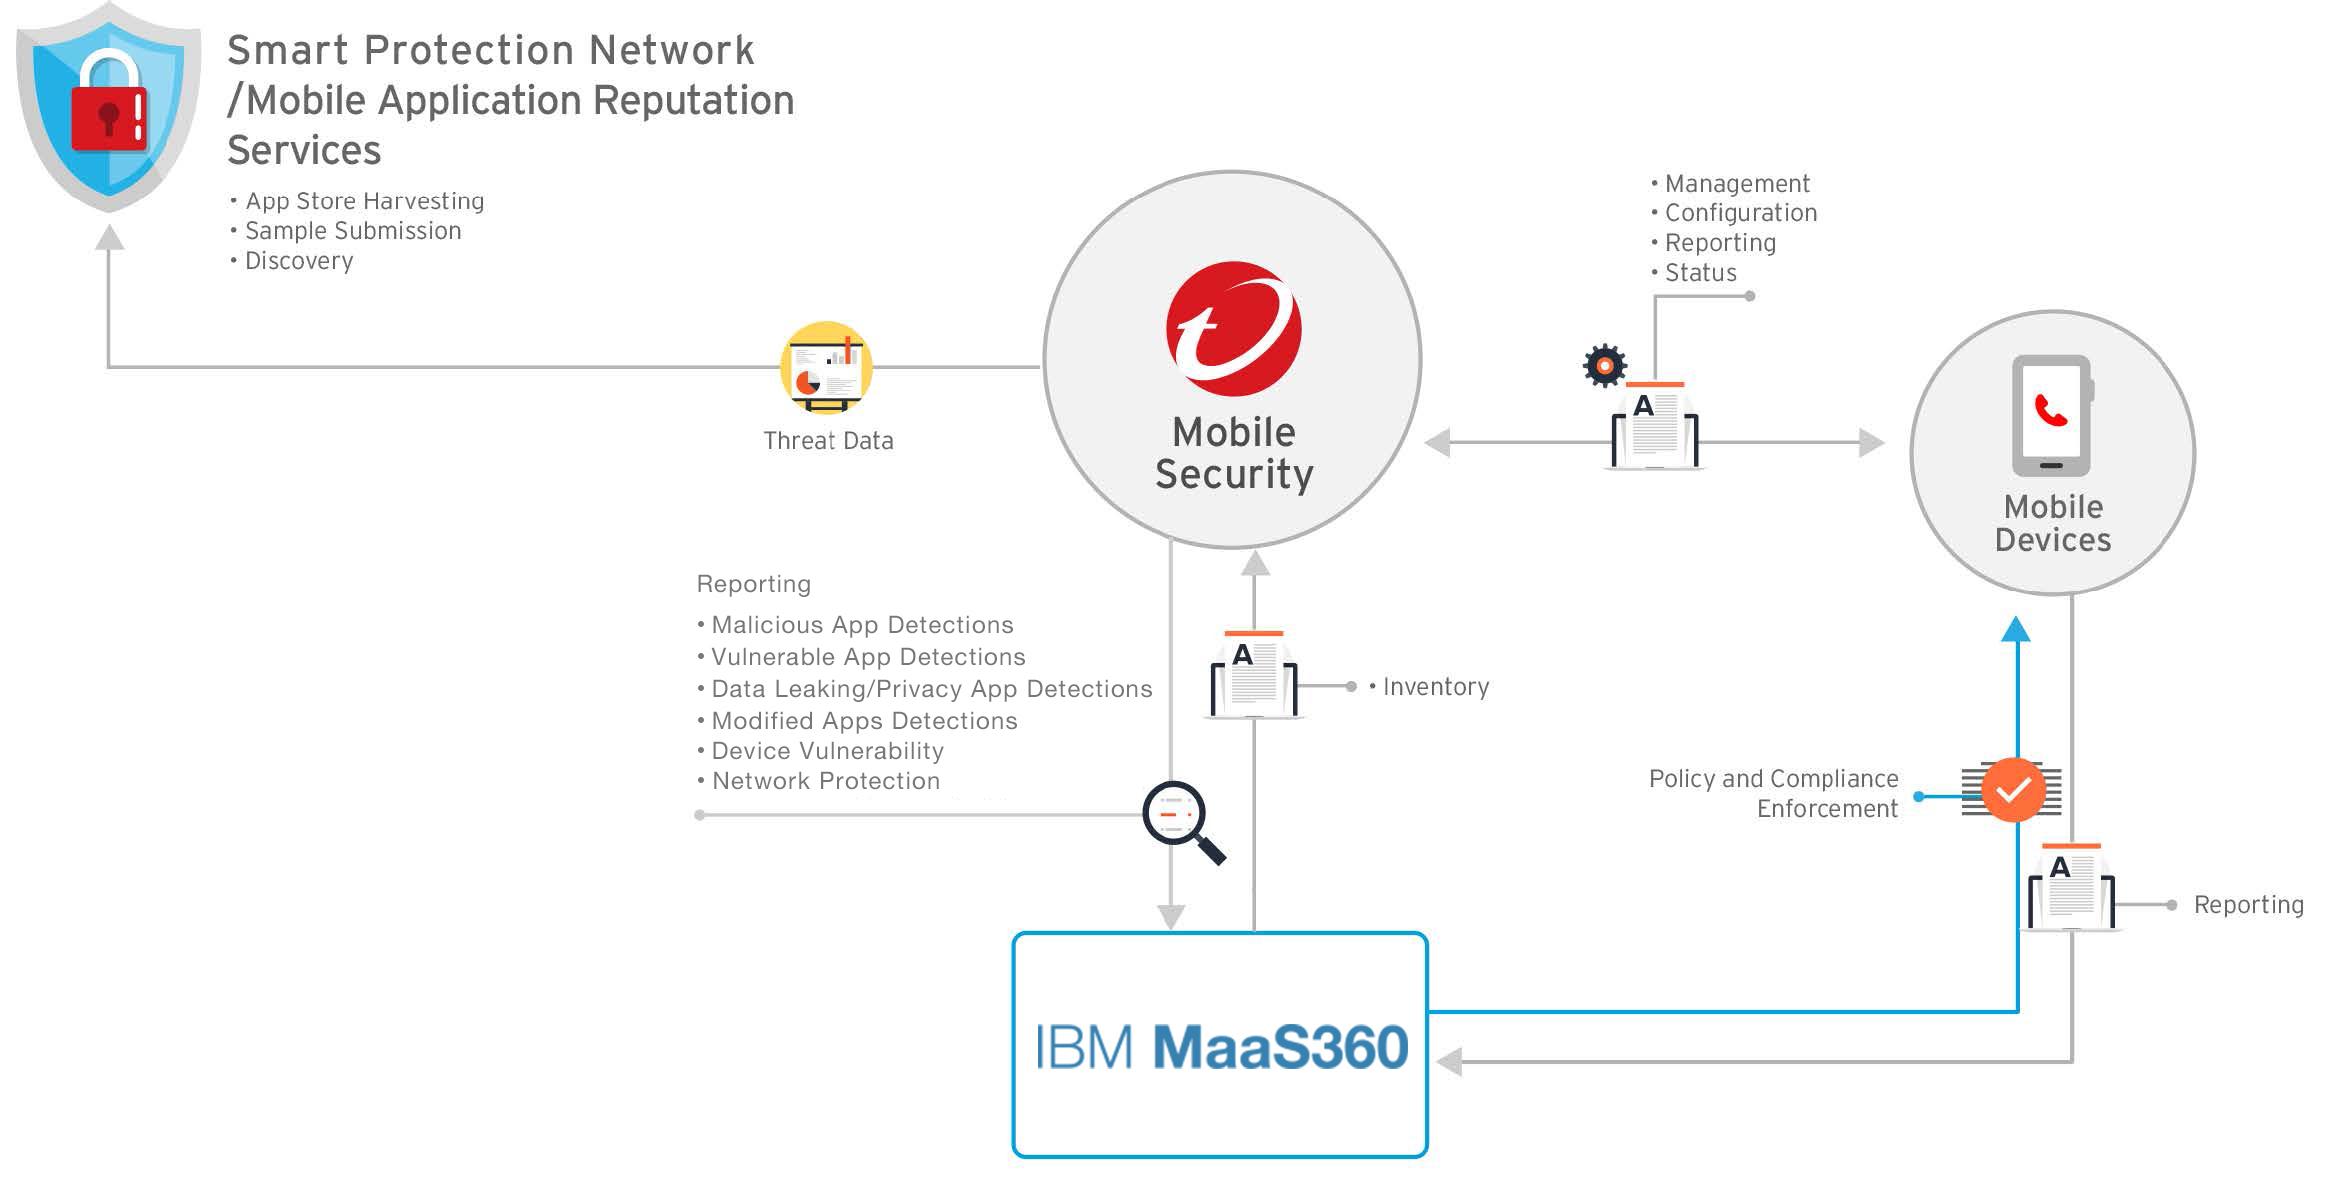 IBM MaaS360 Integration Architecture